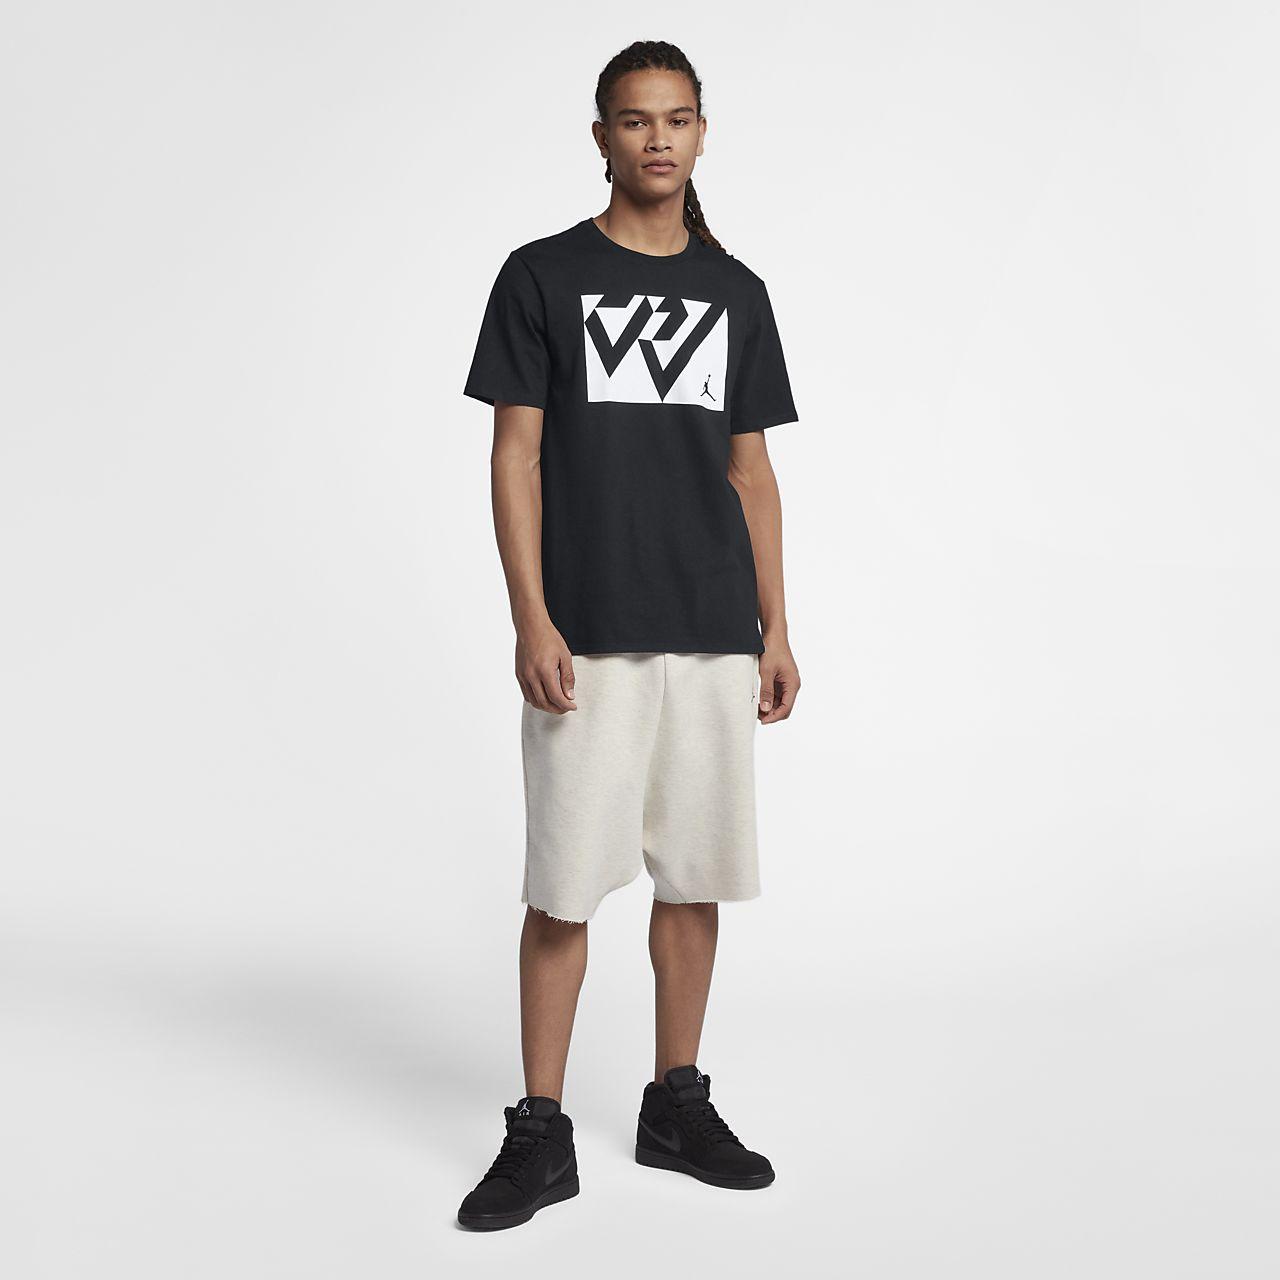 9629896c6febdd Jordan RW Men s T-Shirt. Nike.com